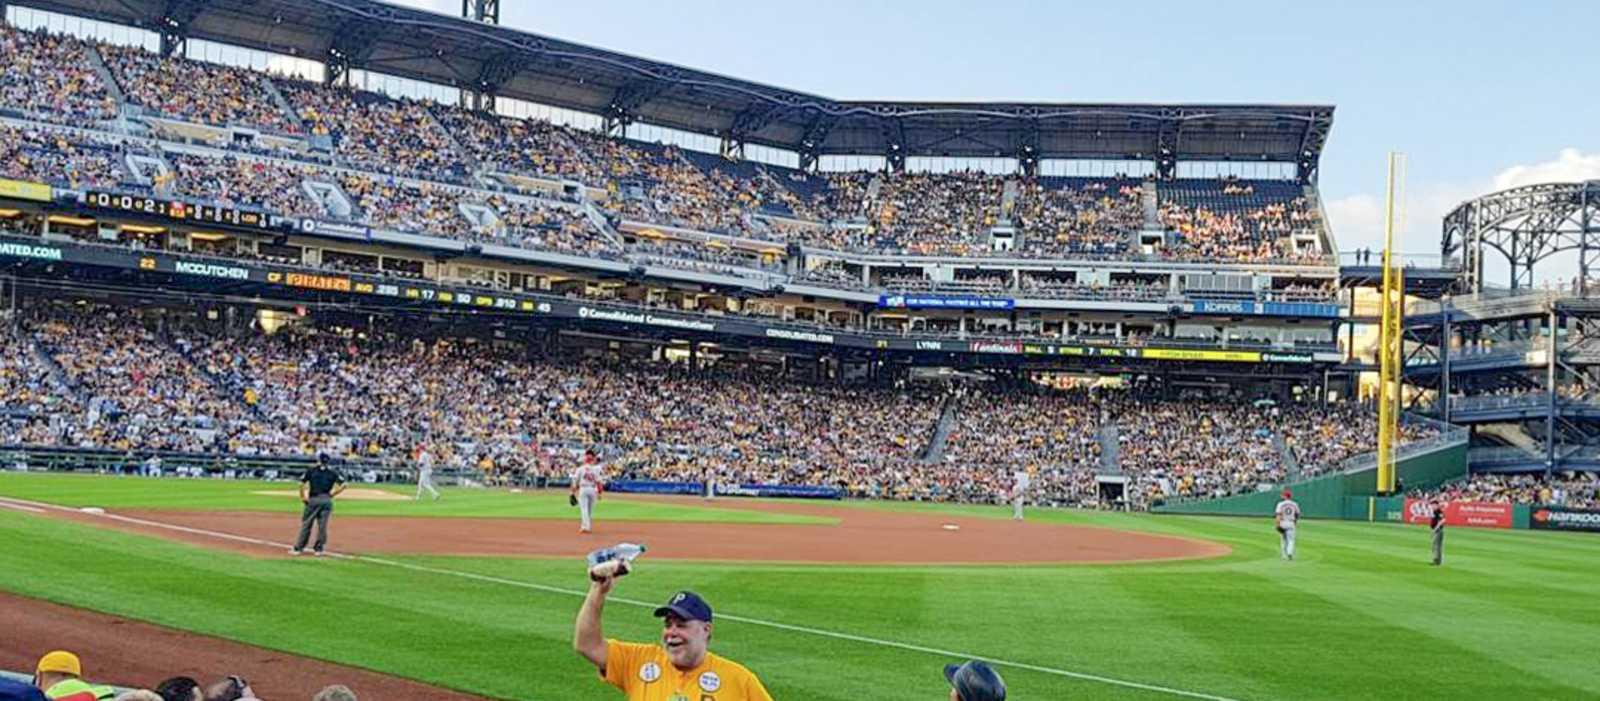 Baseballspiel im PNC Park in Pittsburgh